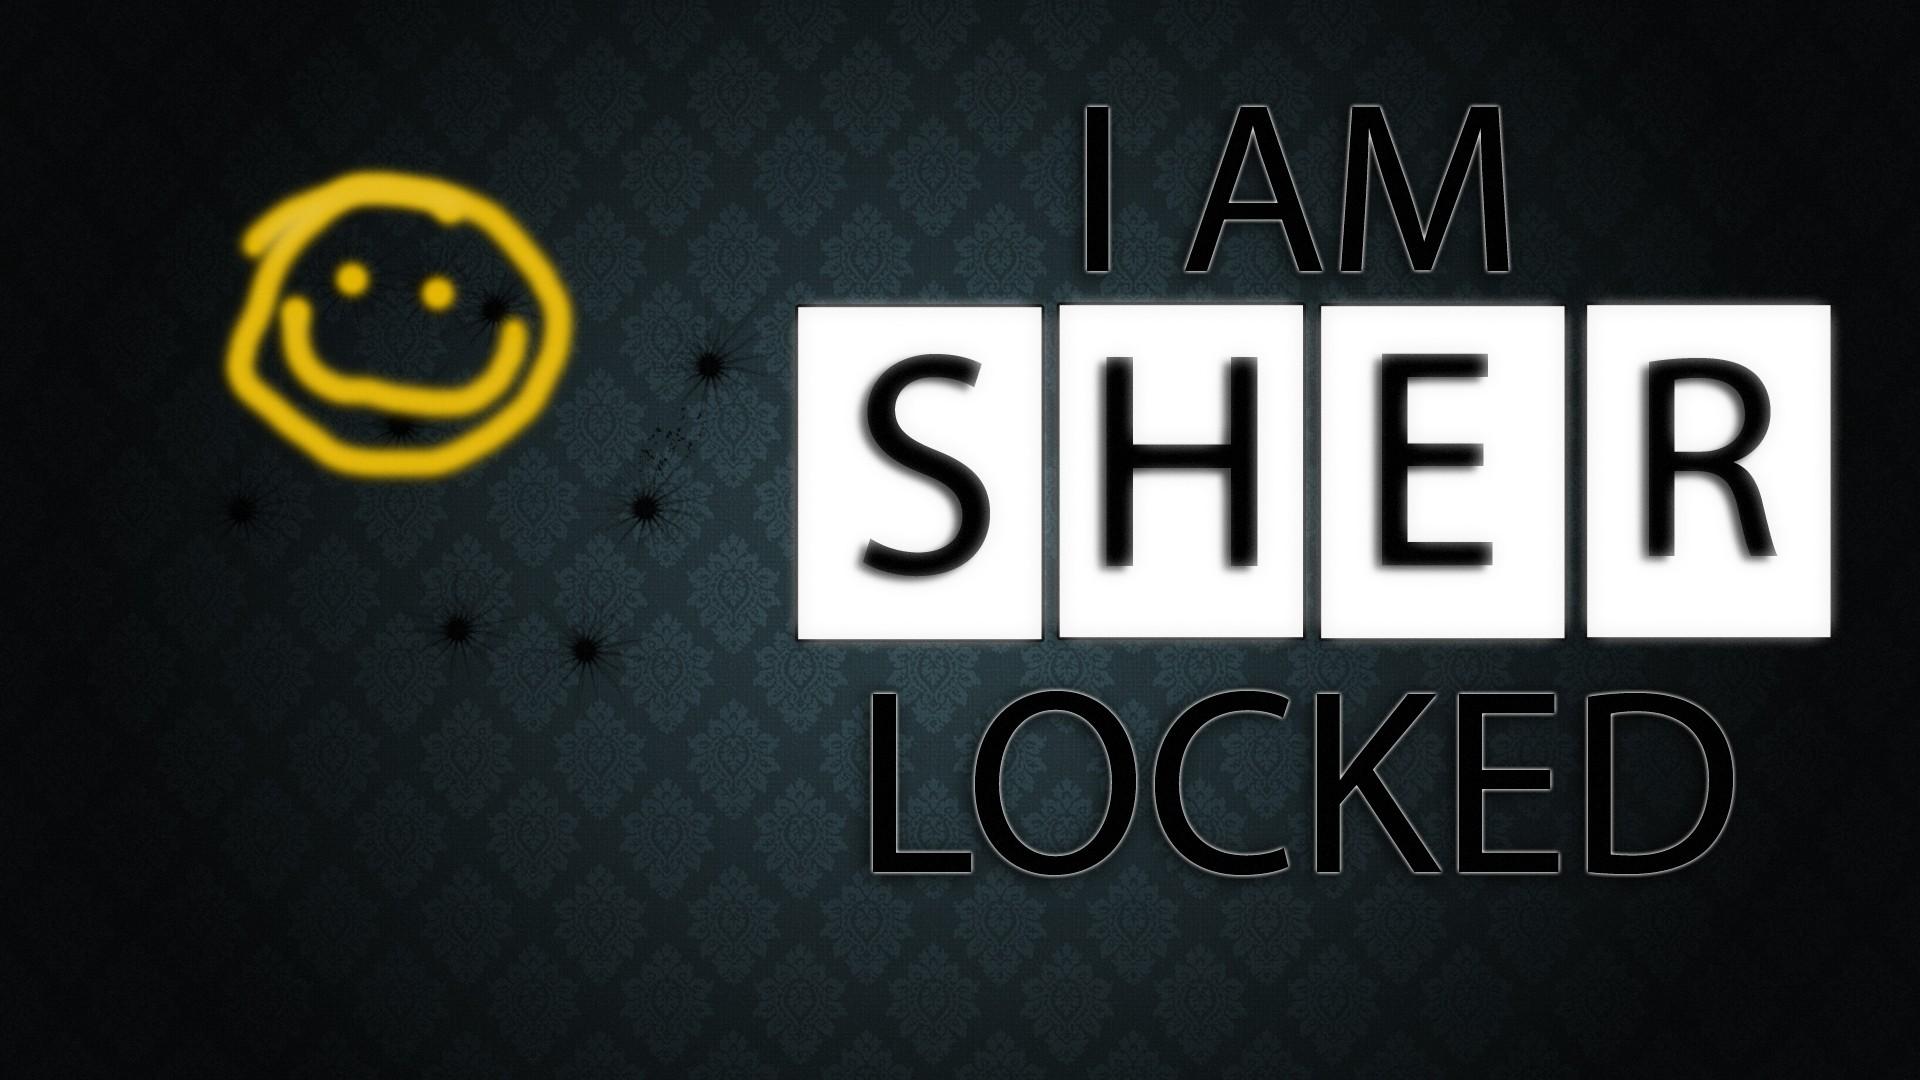 Wallpaper iphone password - Am Sherlocked Iphone Wallpaper I Am Sherlocke